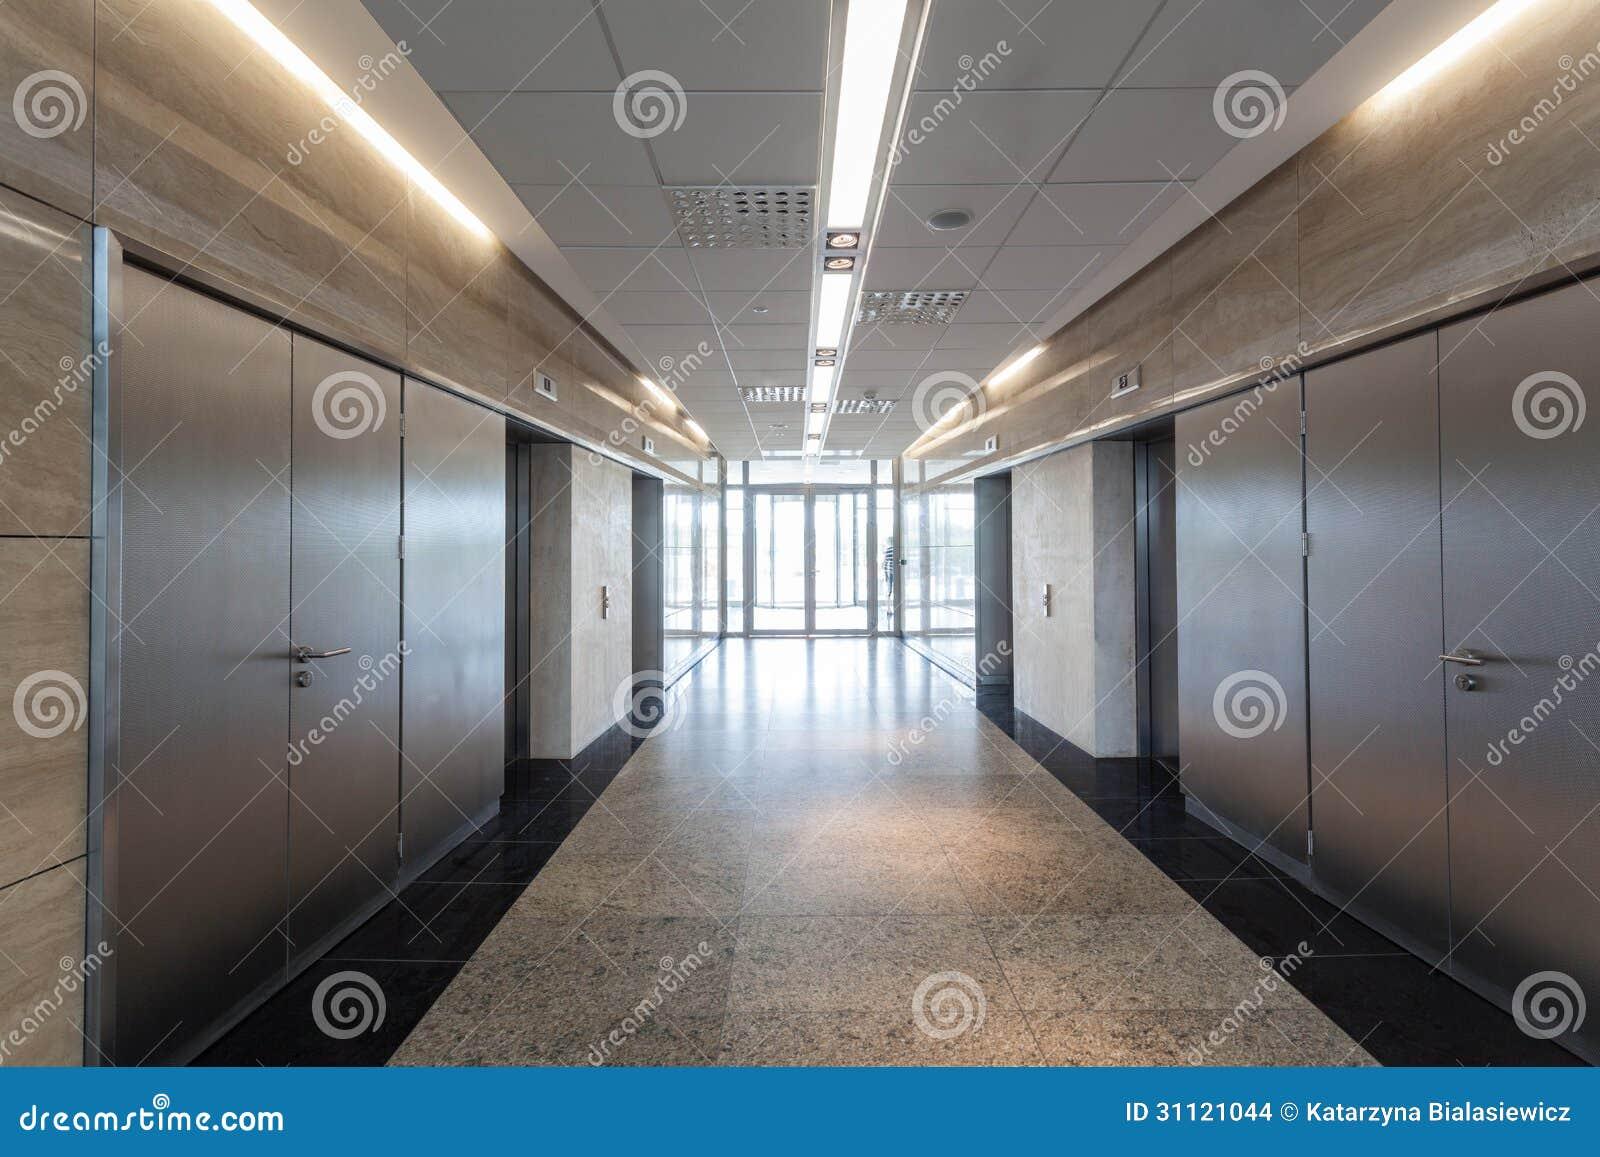 Corridor stock images image 31121044 - Corridor entrance ...